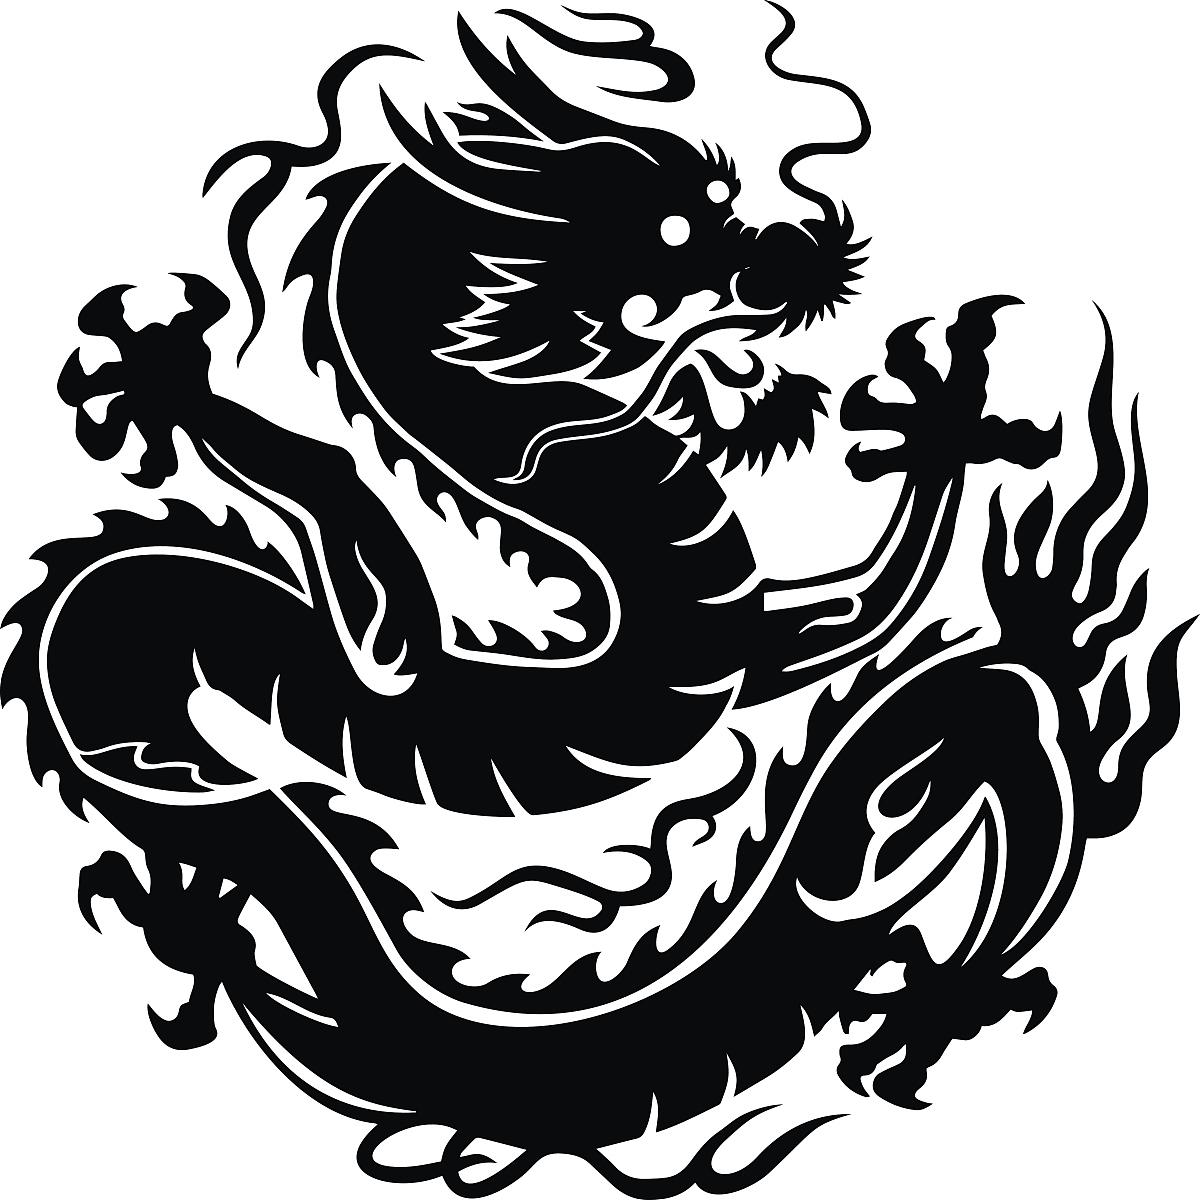 龙_龙,中国龙